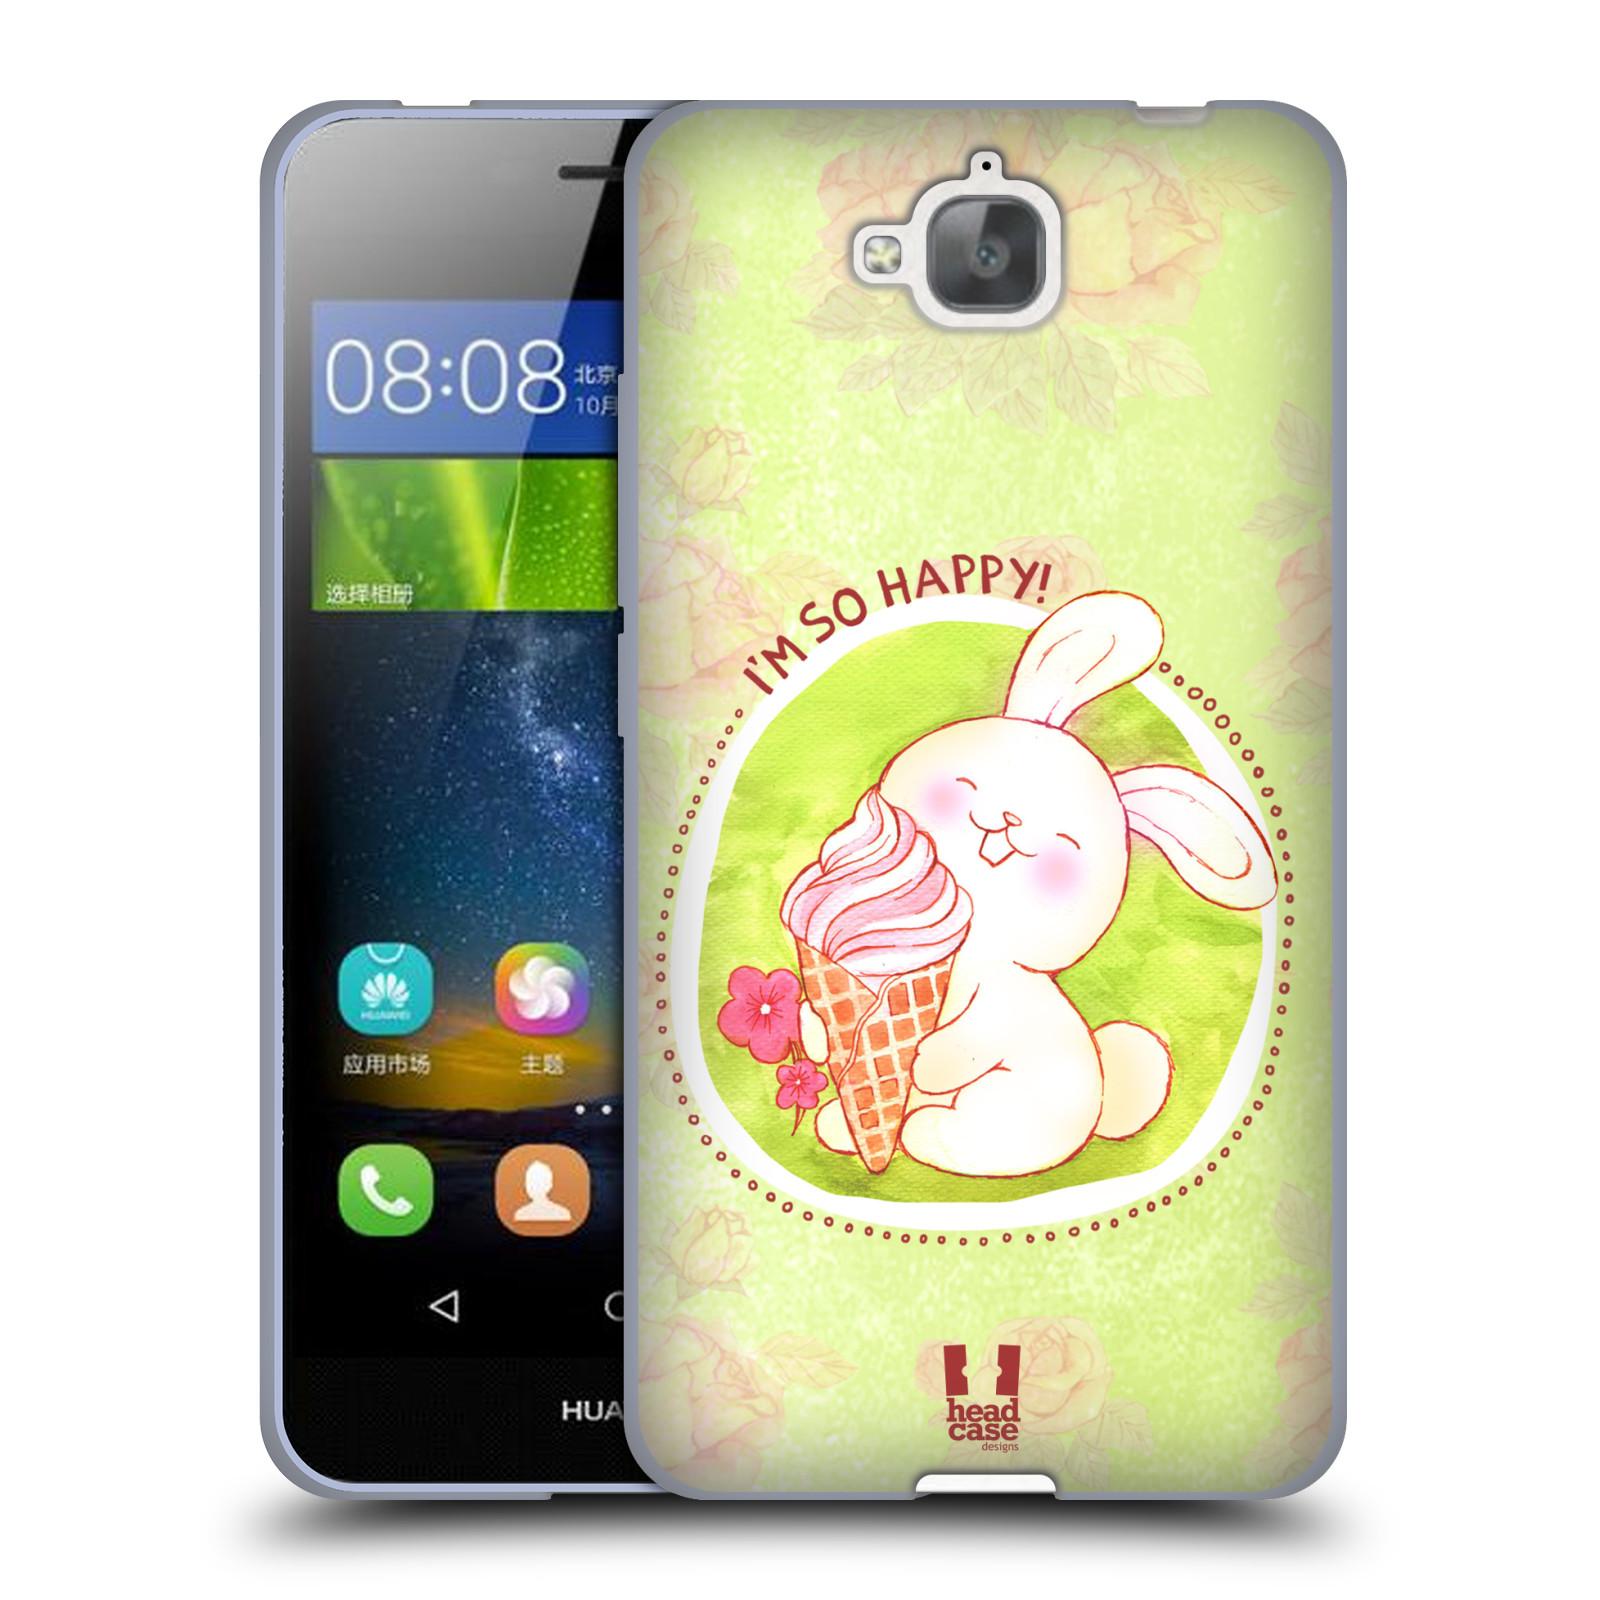 Silikonové pouzdro na mobil Huawei Y6 Pro Dual Sim HEAD CASE KRÁLÍČEK A ZMRZKA